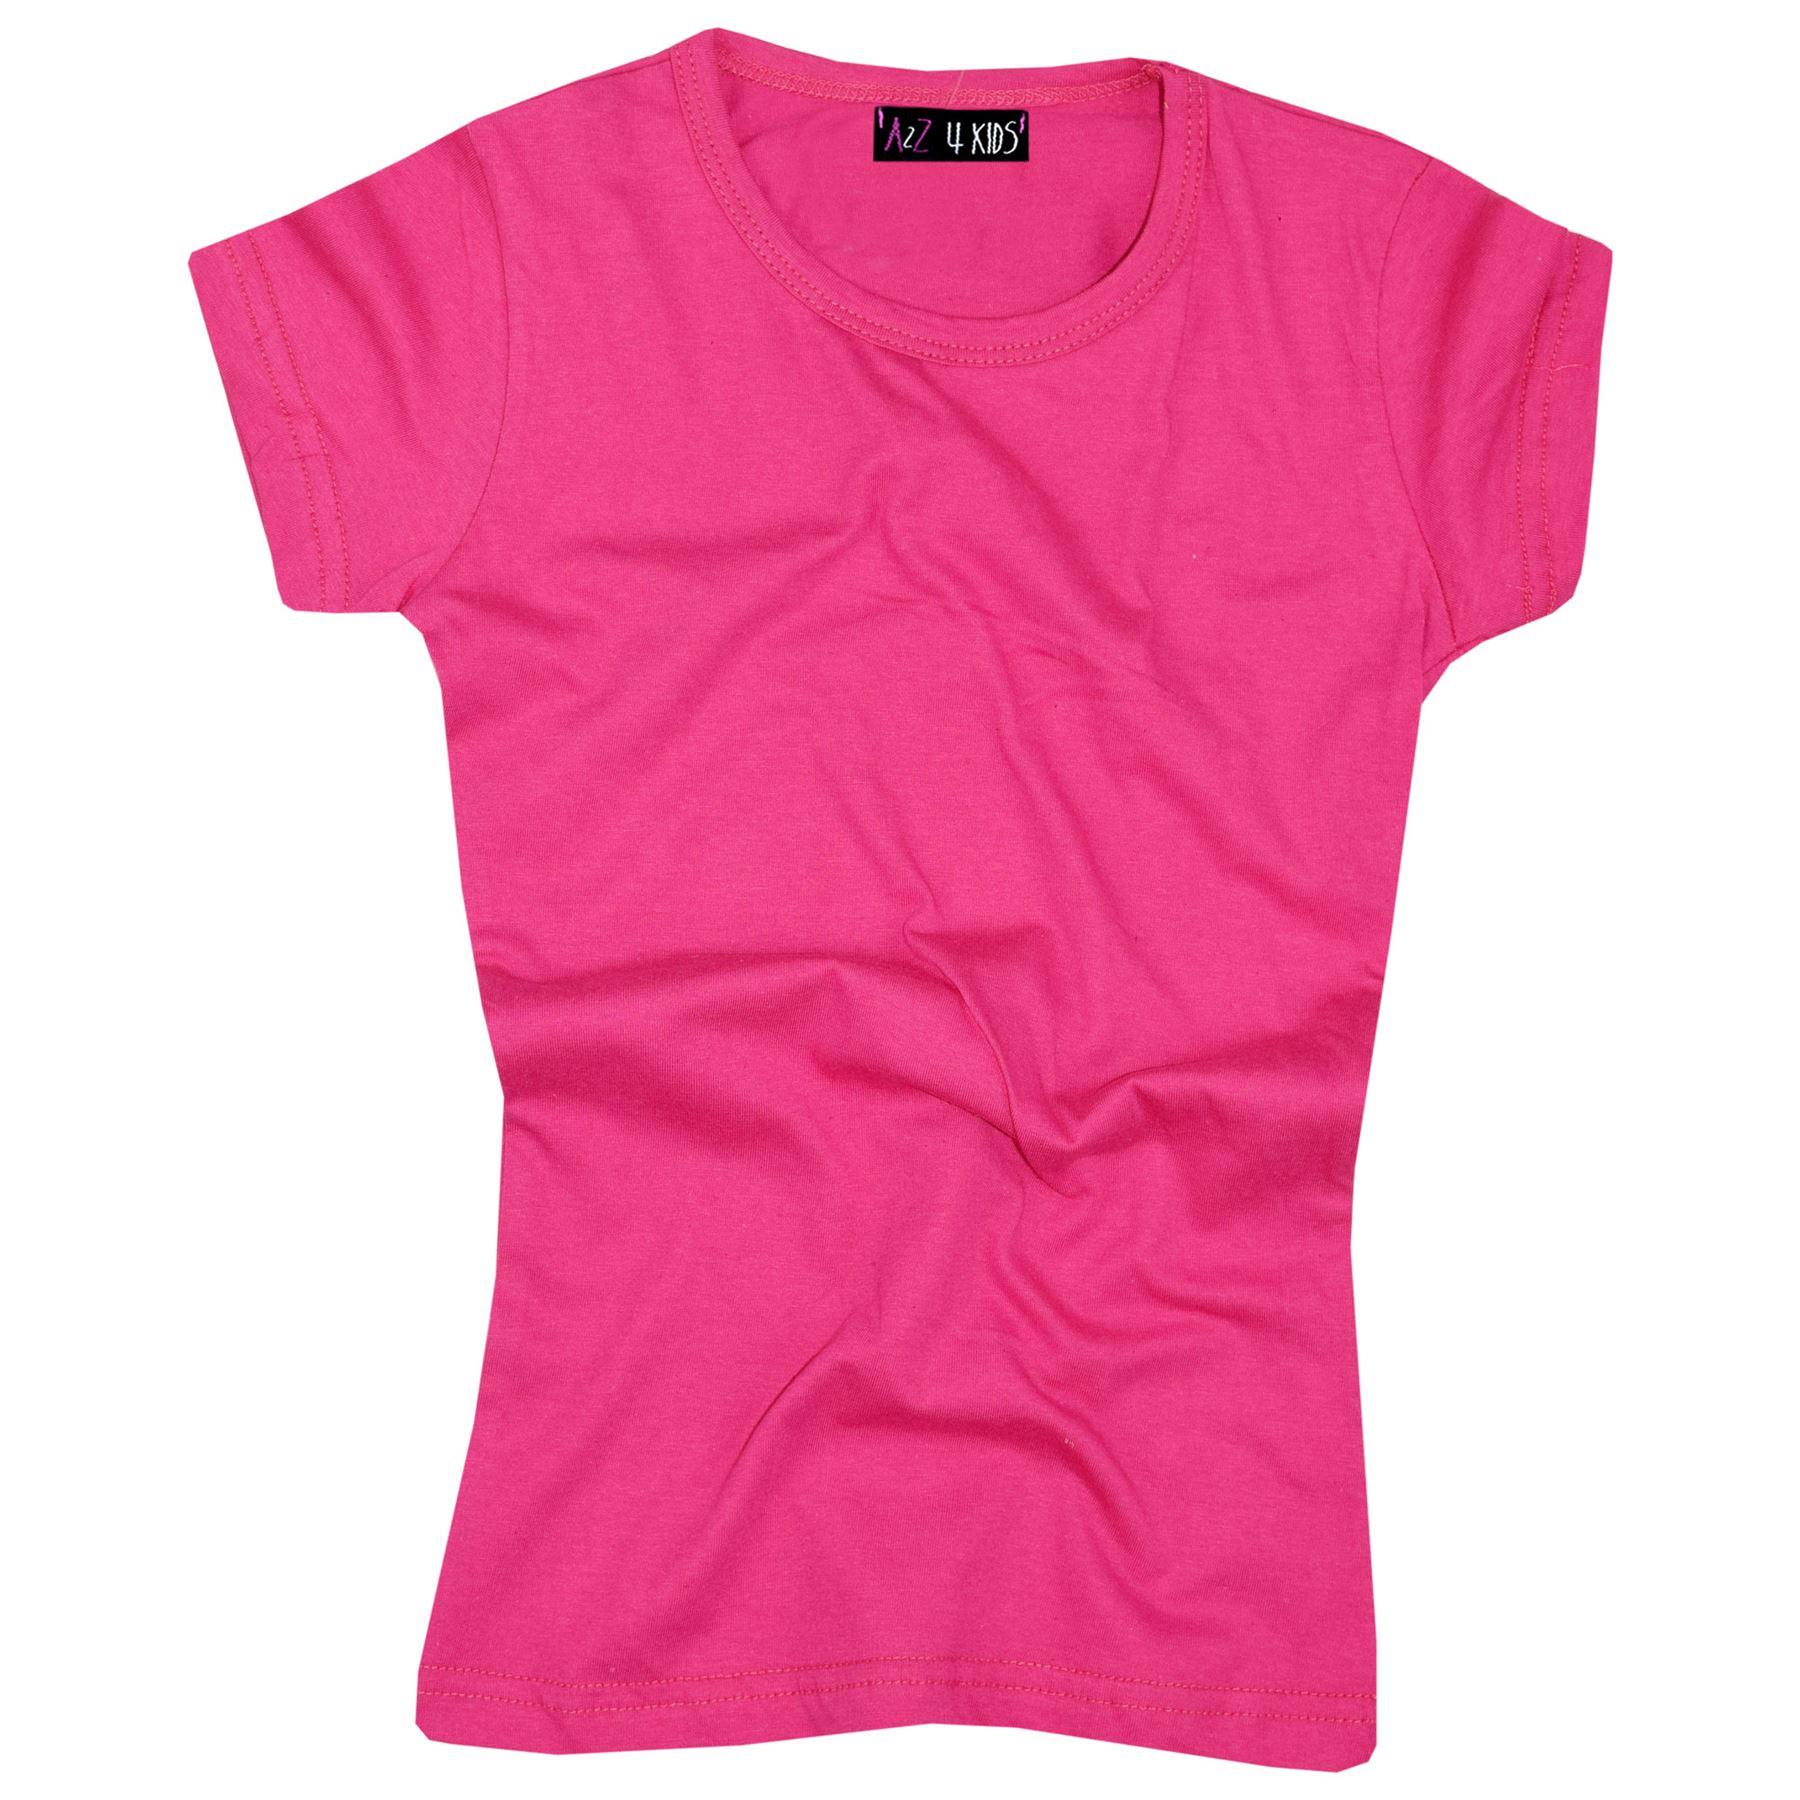 Kids-Girls-T-Shirts-Designer-100-Cotton-Plain-School-T-Shirt-Top-New-Age-3-13Yr thumbnail 29